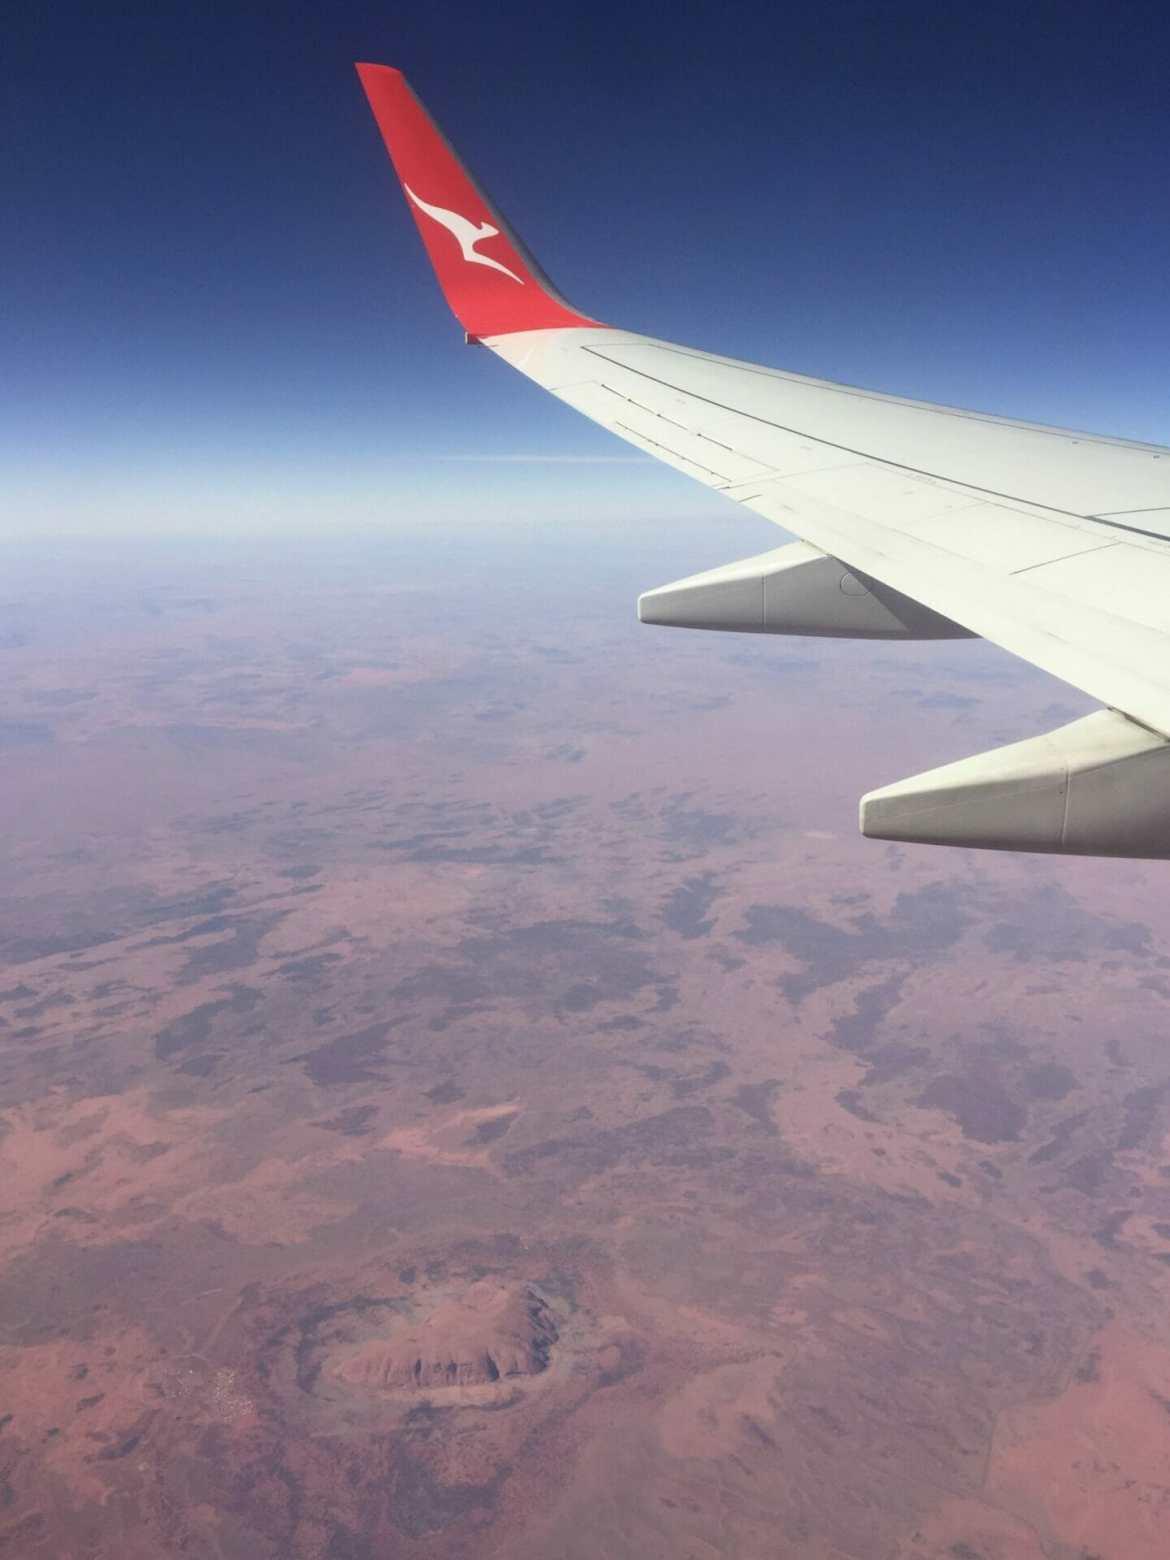 Qantas plane over Uluru Australia